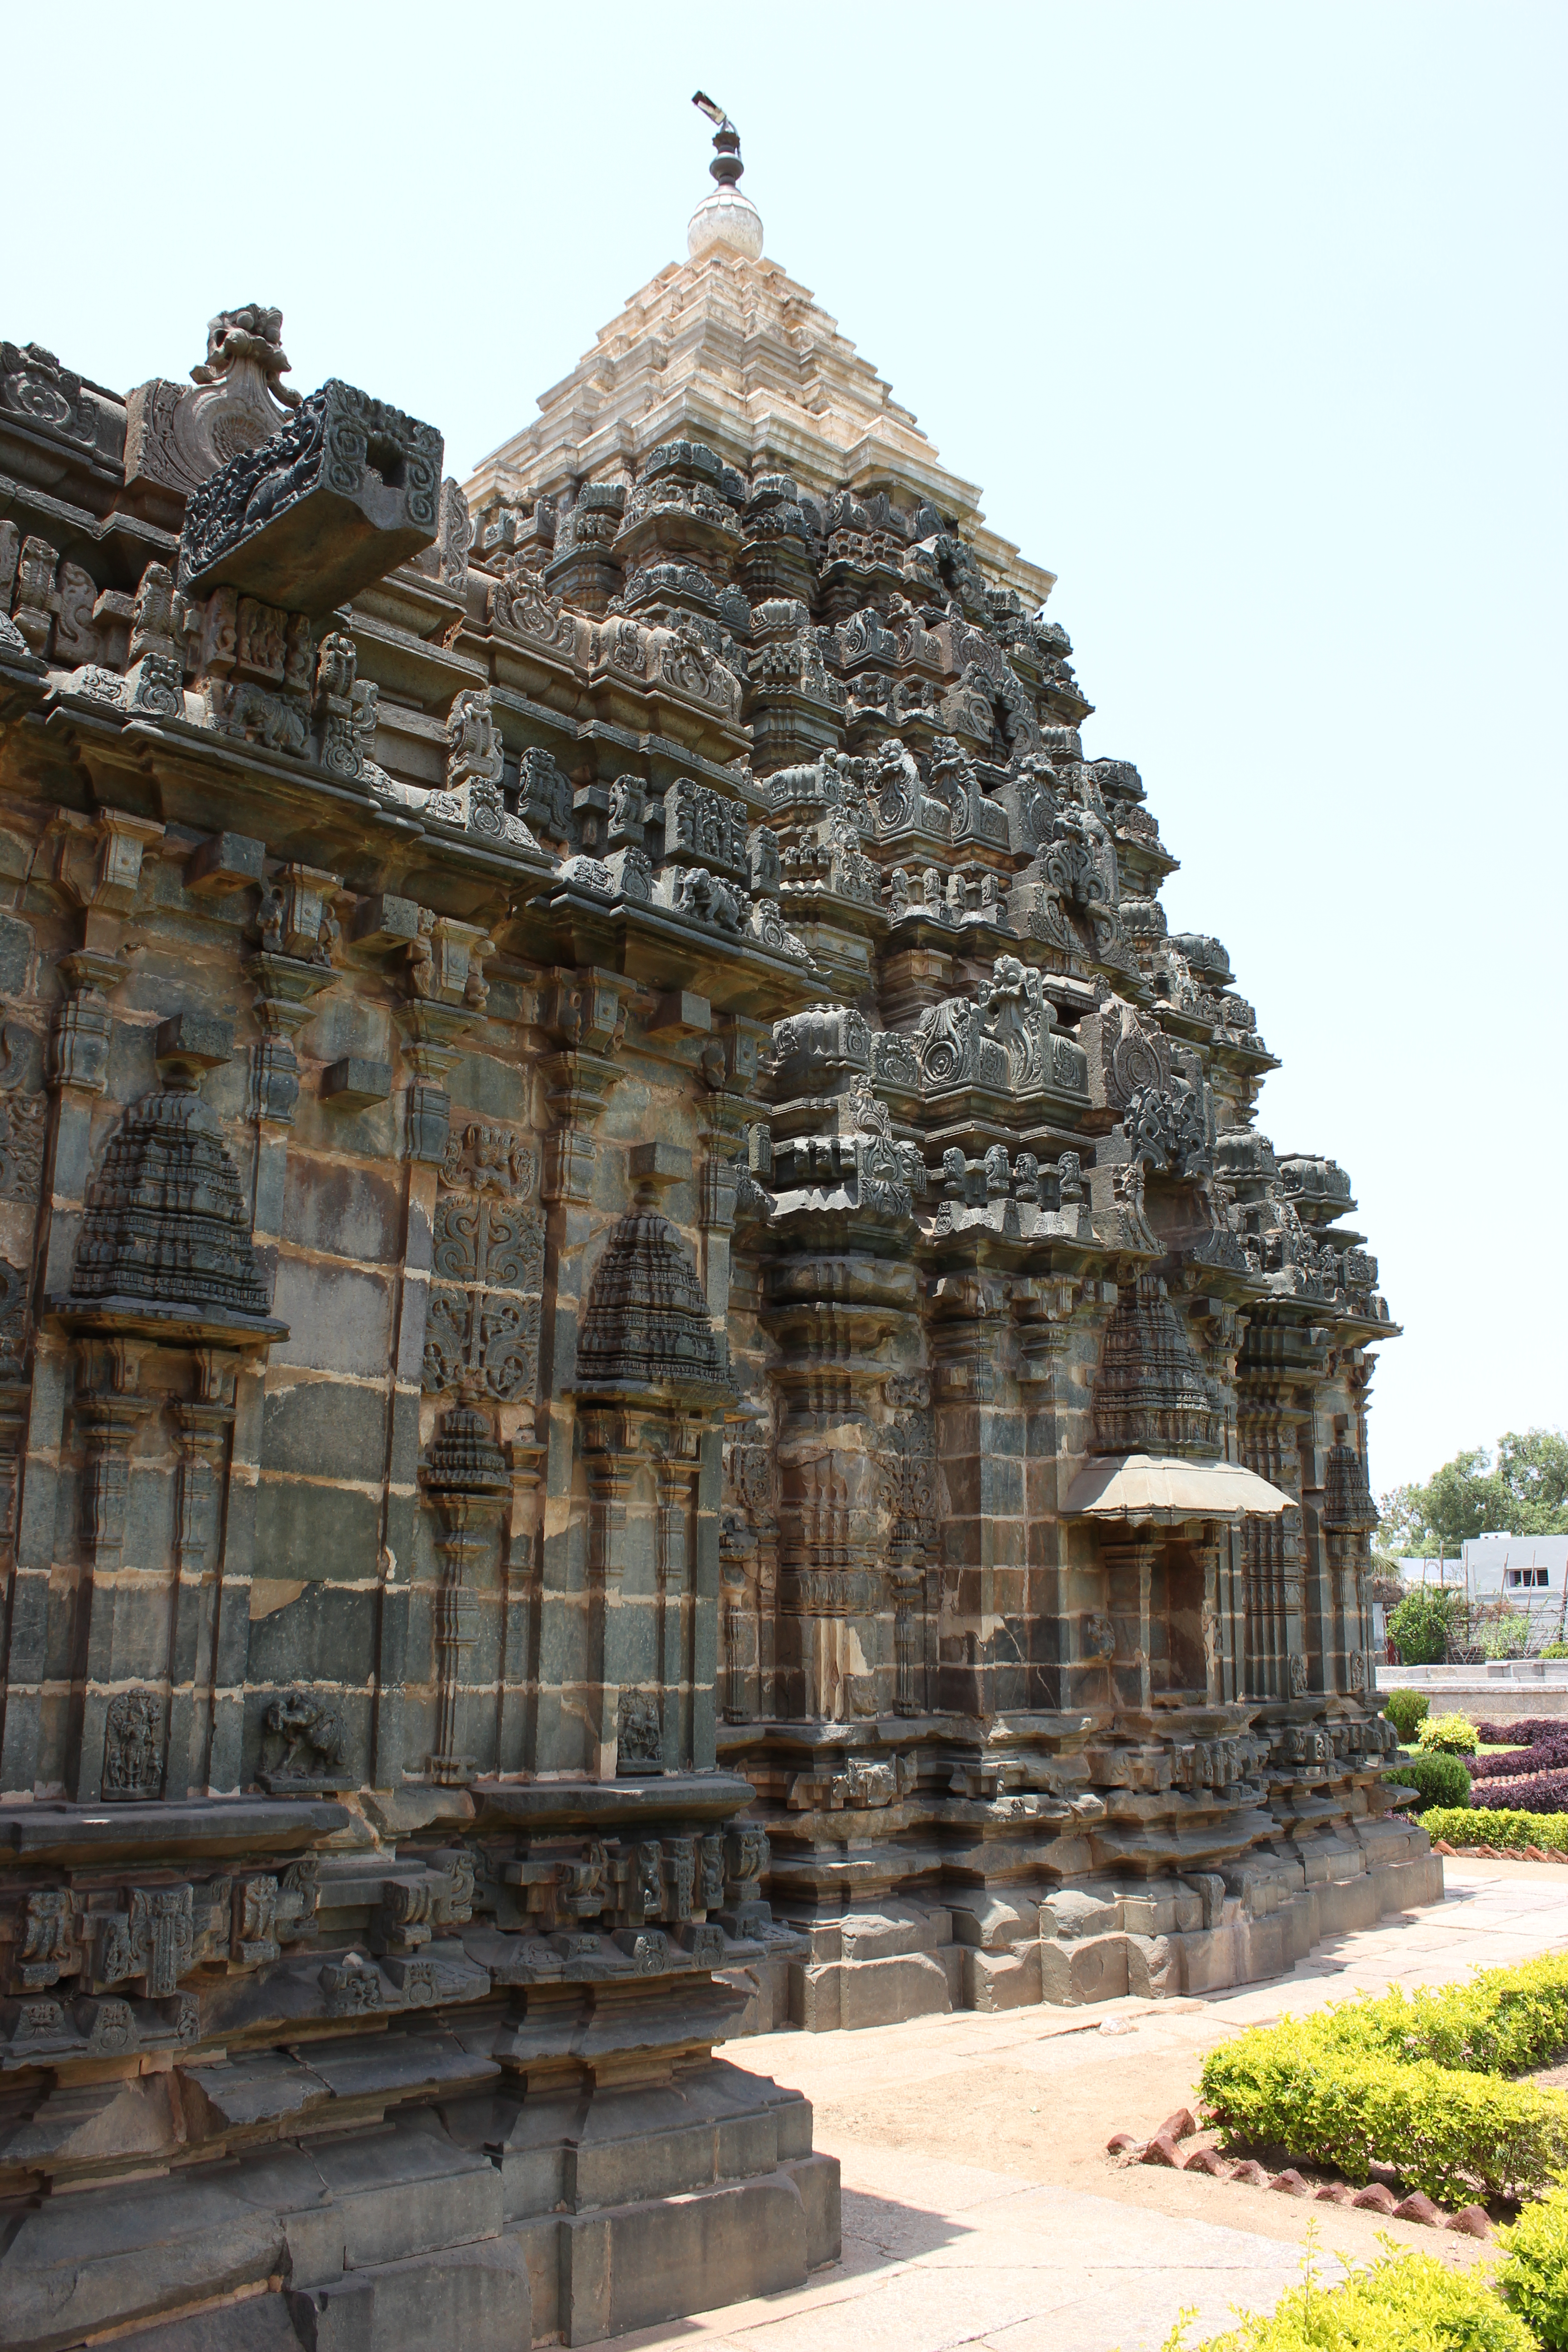 Mahadeva Temple Mahadeva Temple at Itagi